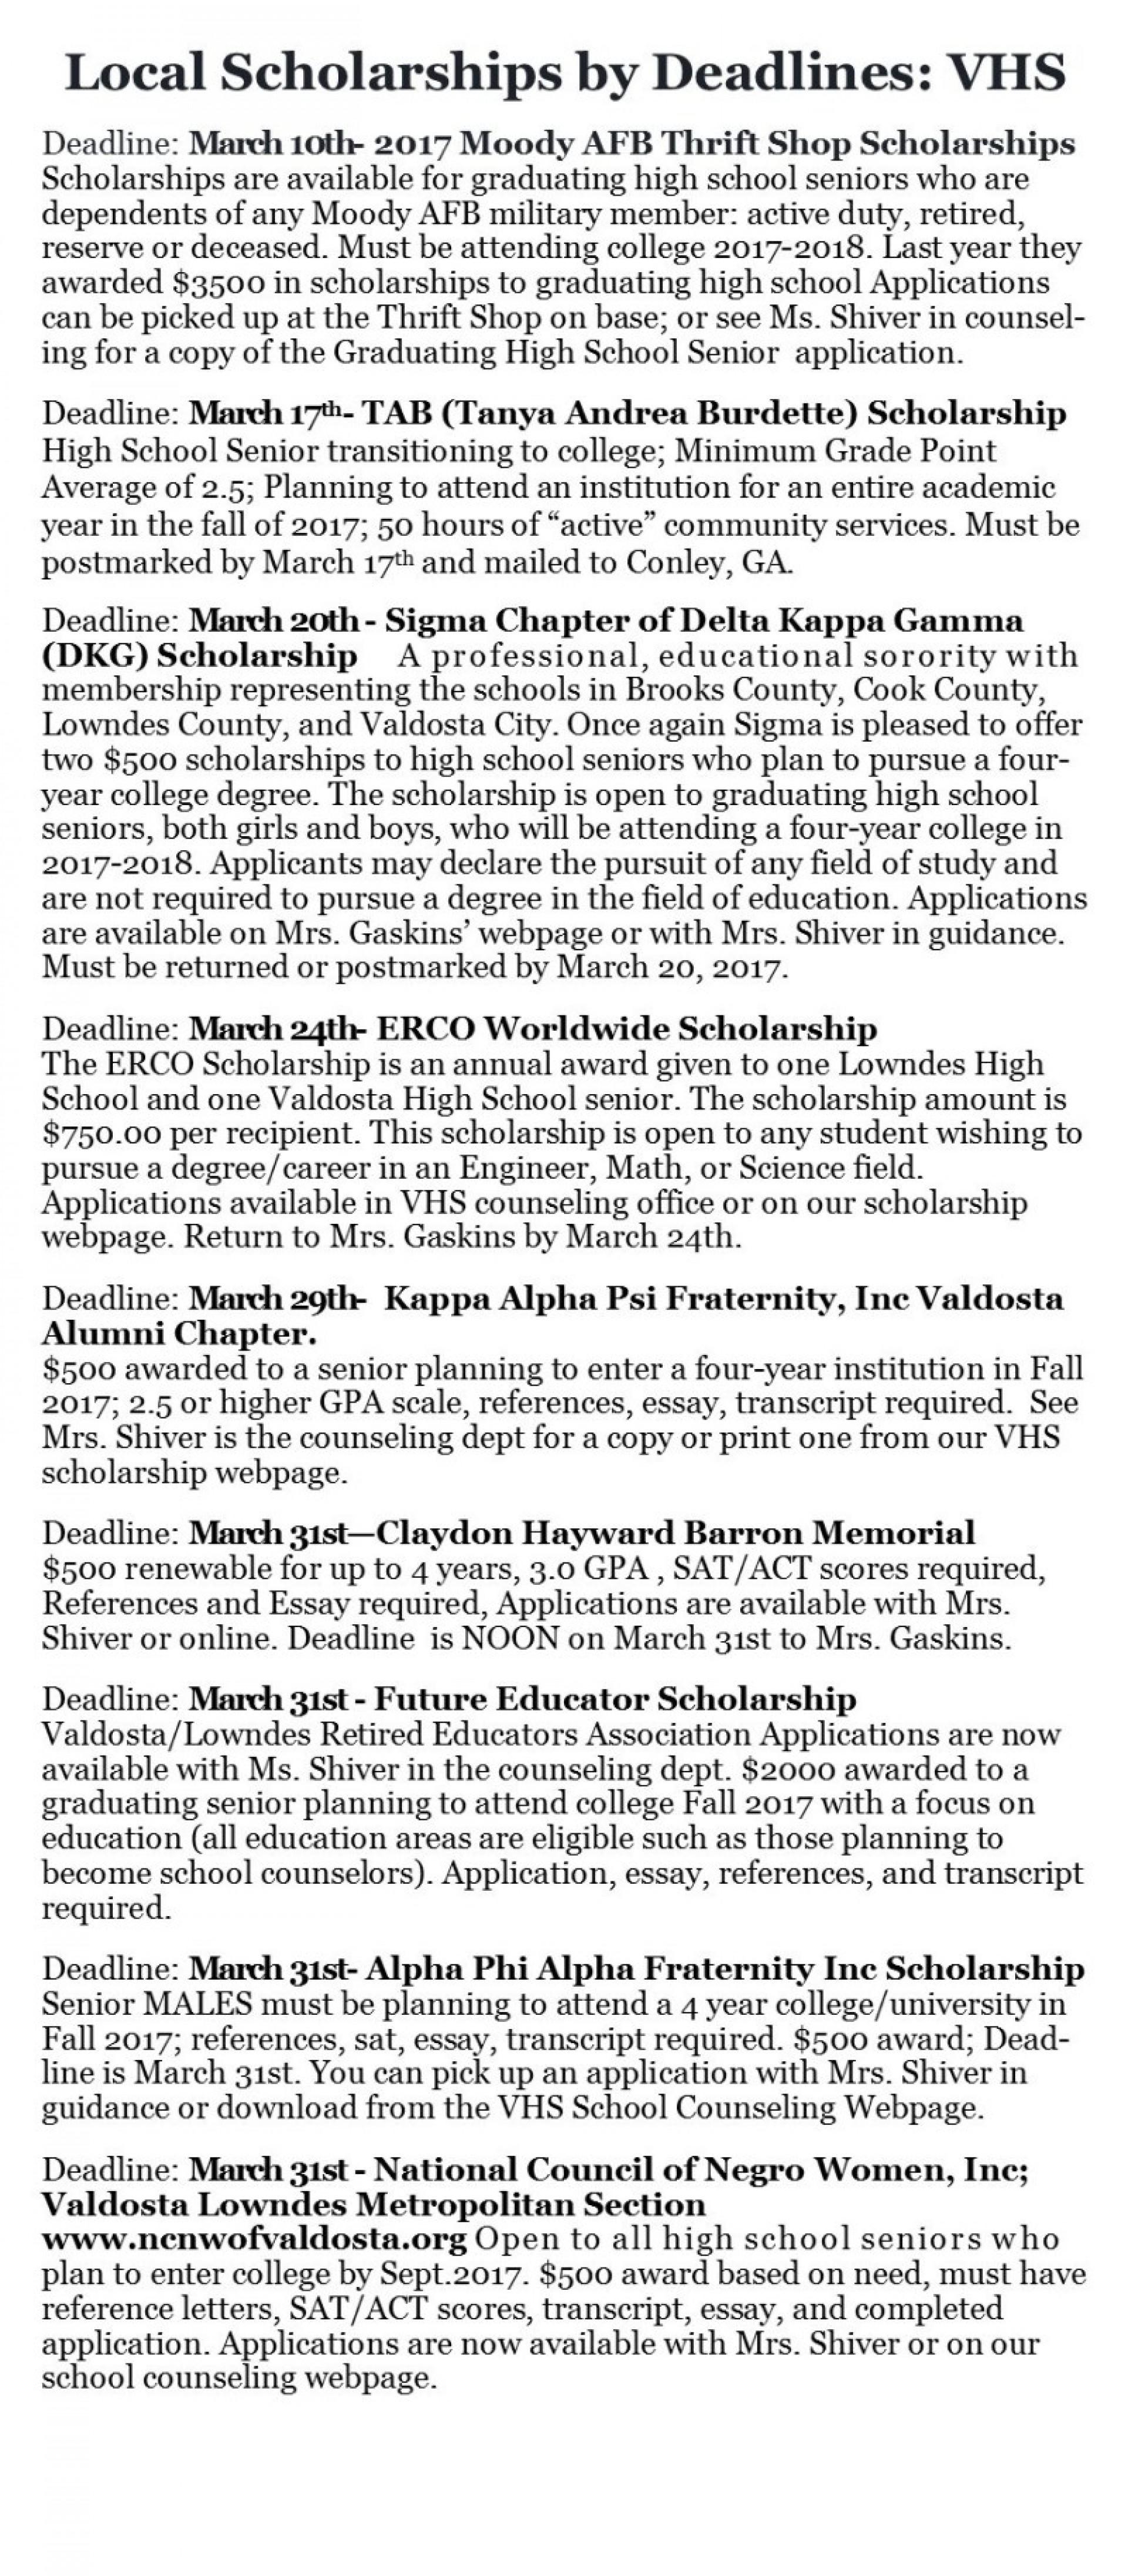 012 Shorty Scholarships Withys For High School Seniors Poemsrom Co Tinetby5eqpfuhec2cd5mlc30c12uavsxxp5rodkzqo In California Texas Class Of Free No Amazing Short Essay College Easy 1920